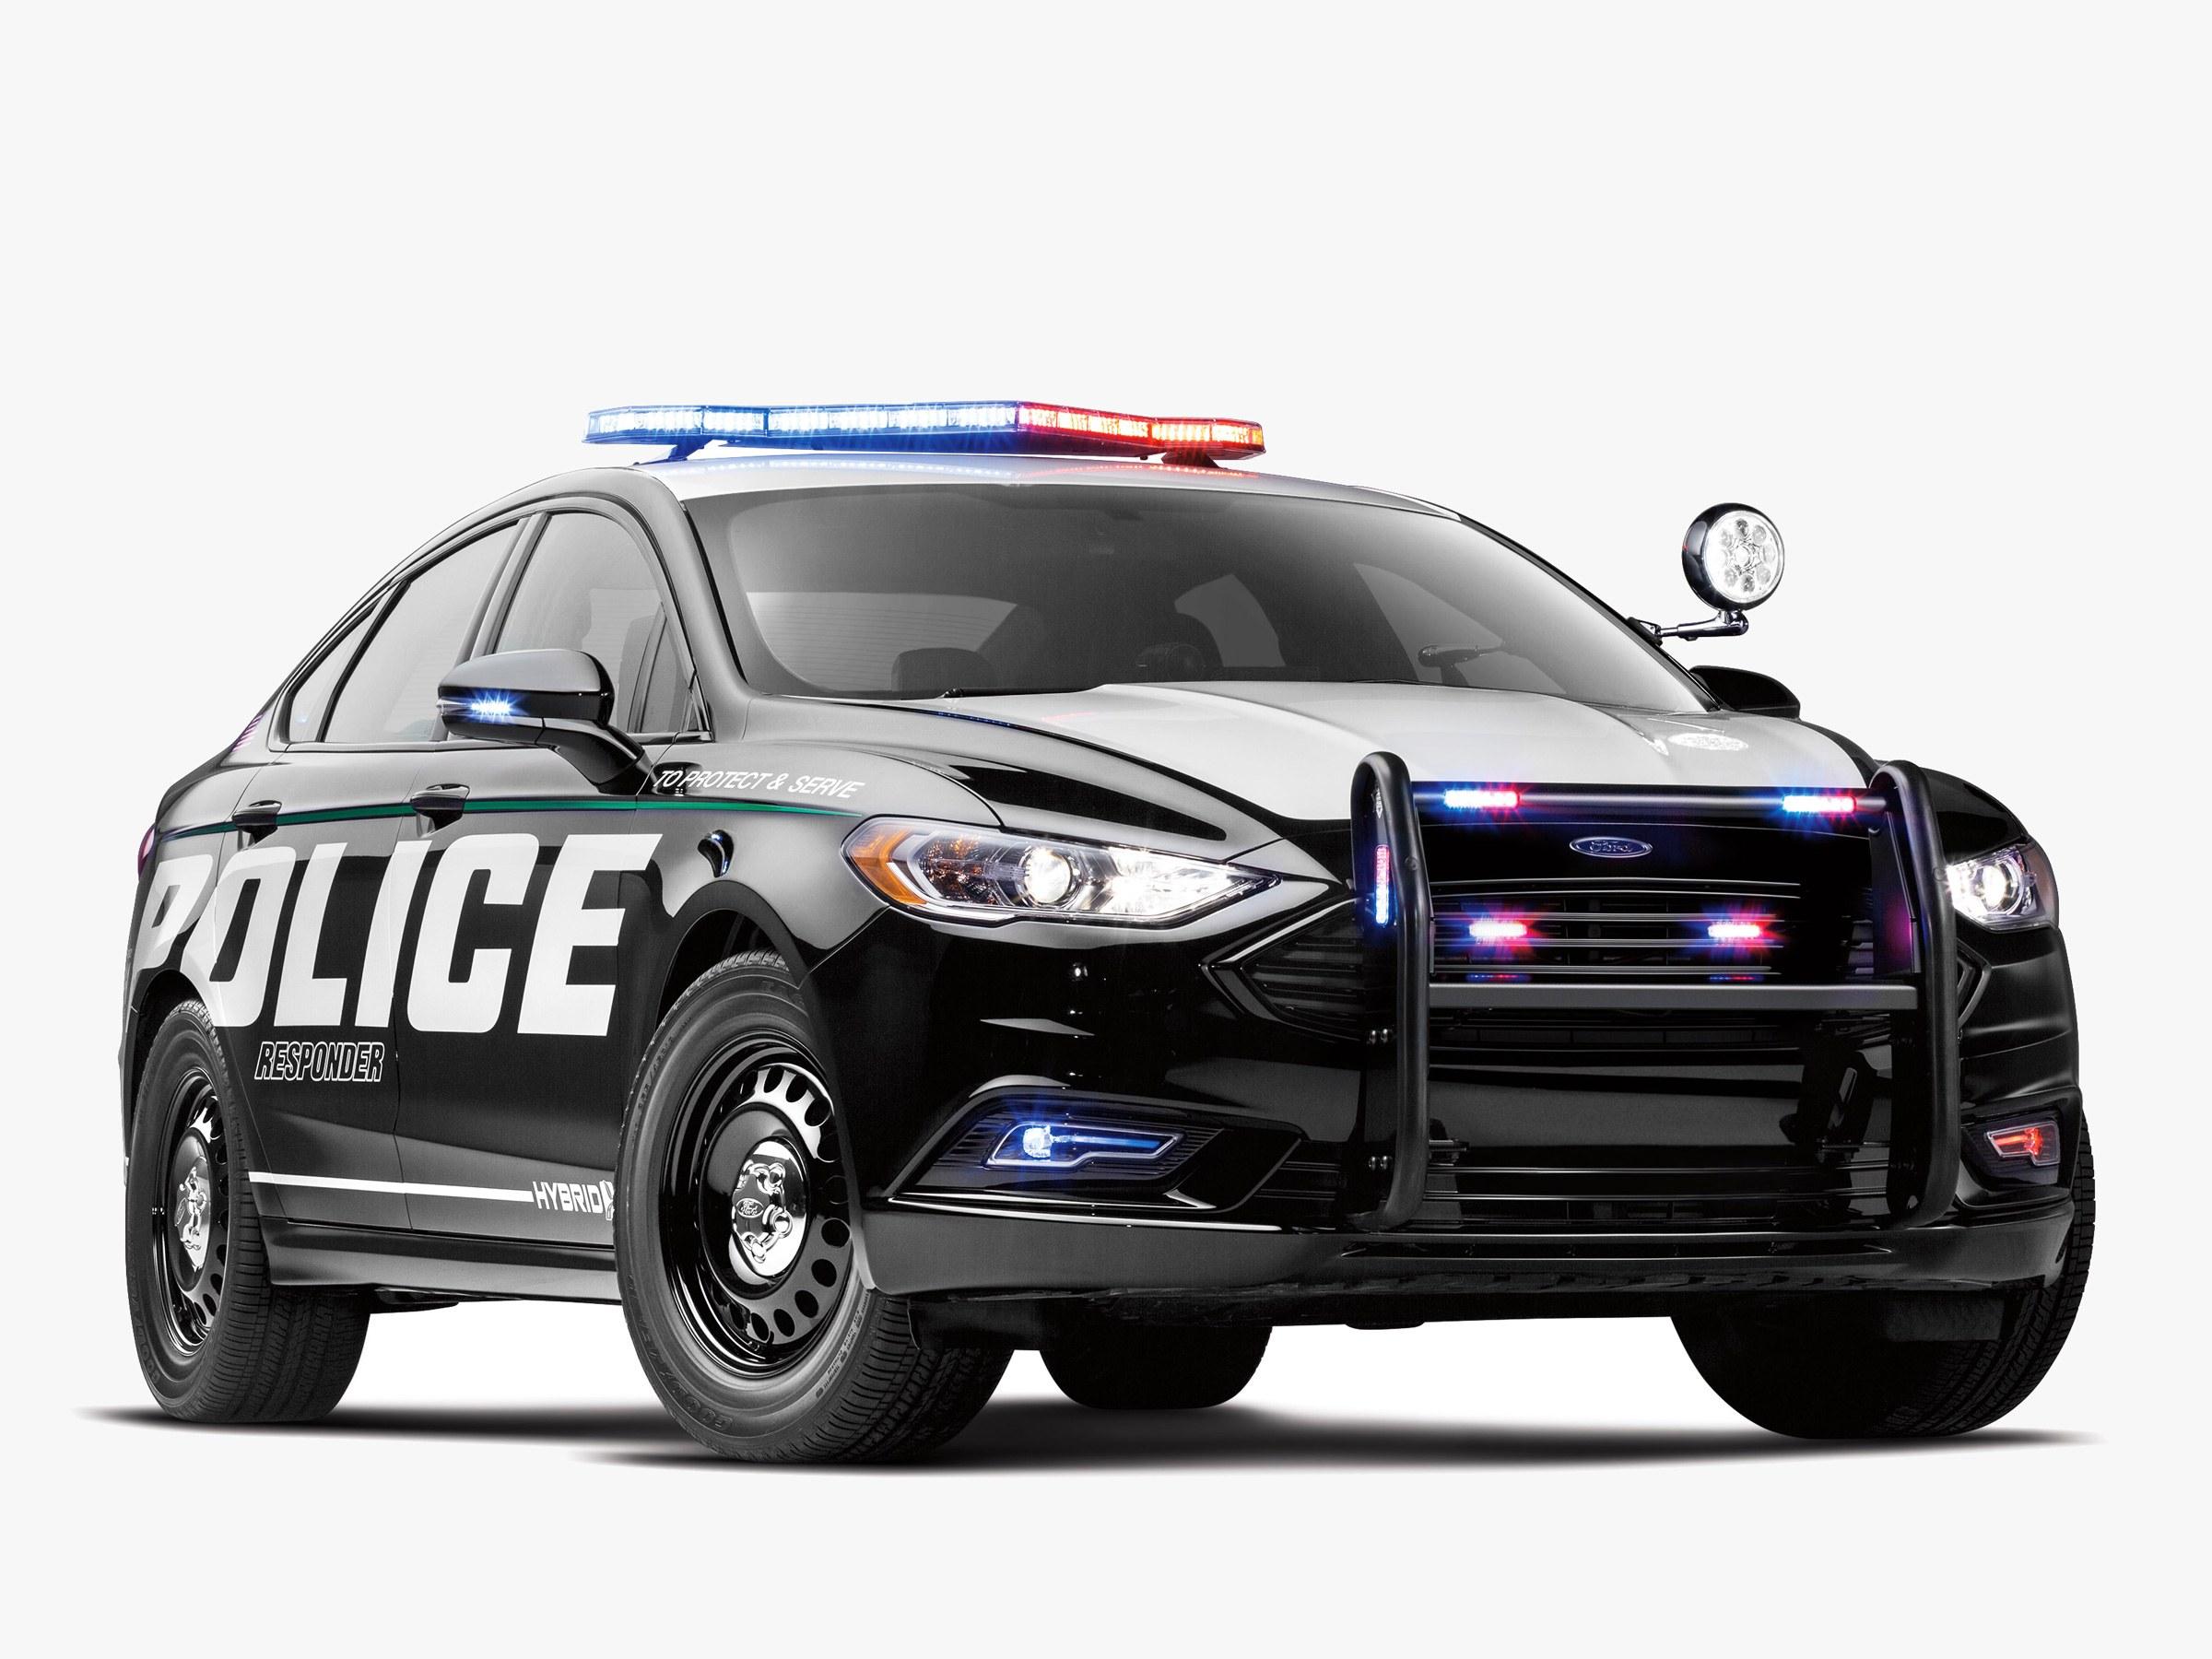 Ford's First Hybrid Cop Car—The Police Responder Hybrid Sedan | WIRED